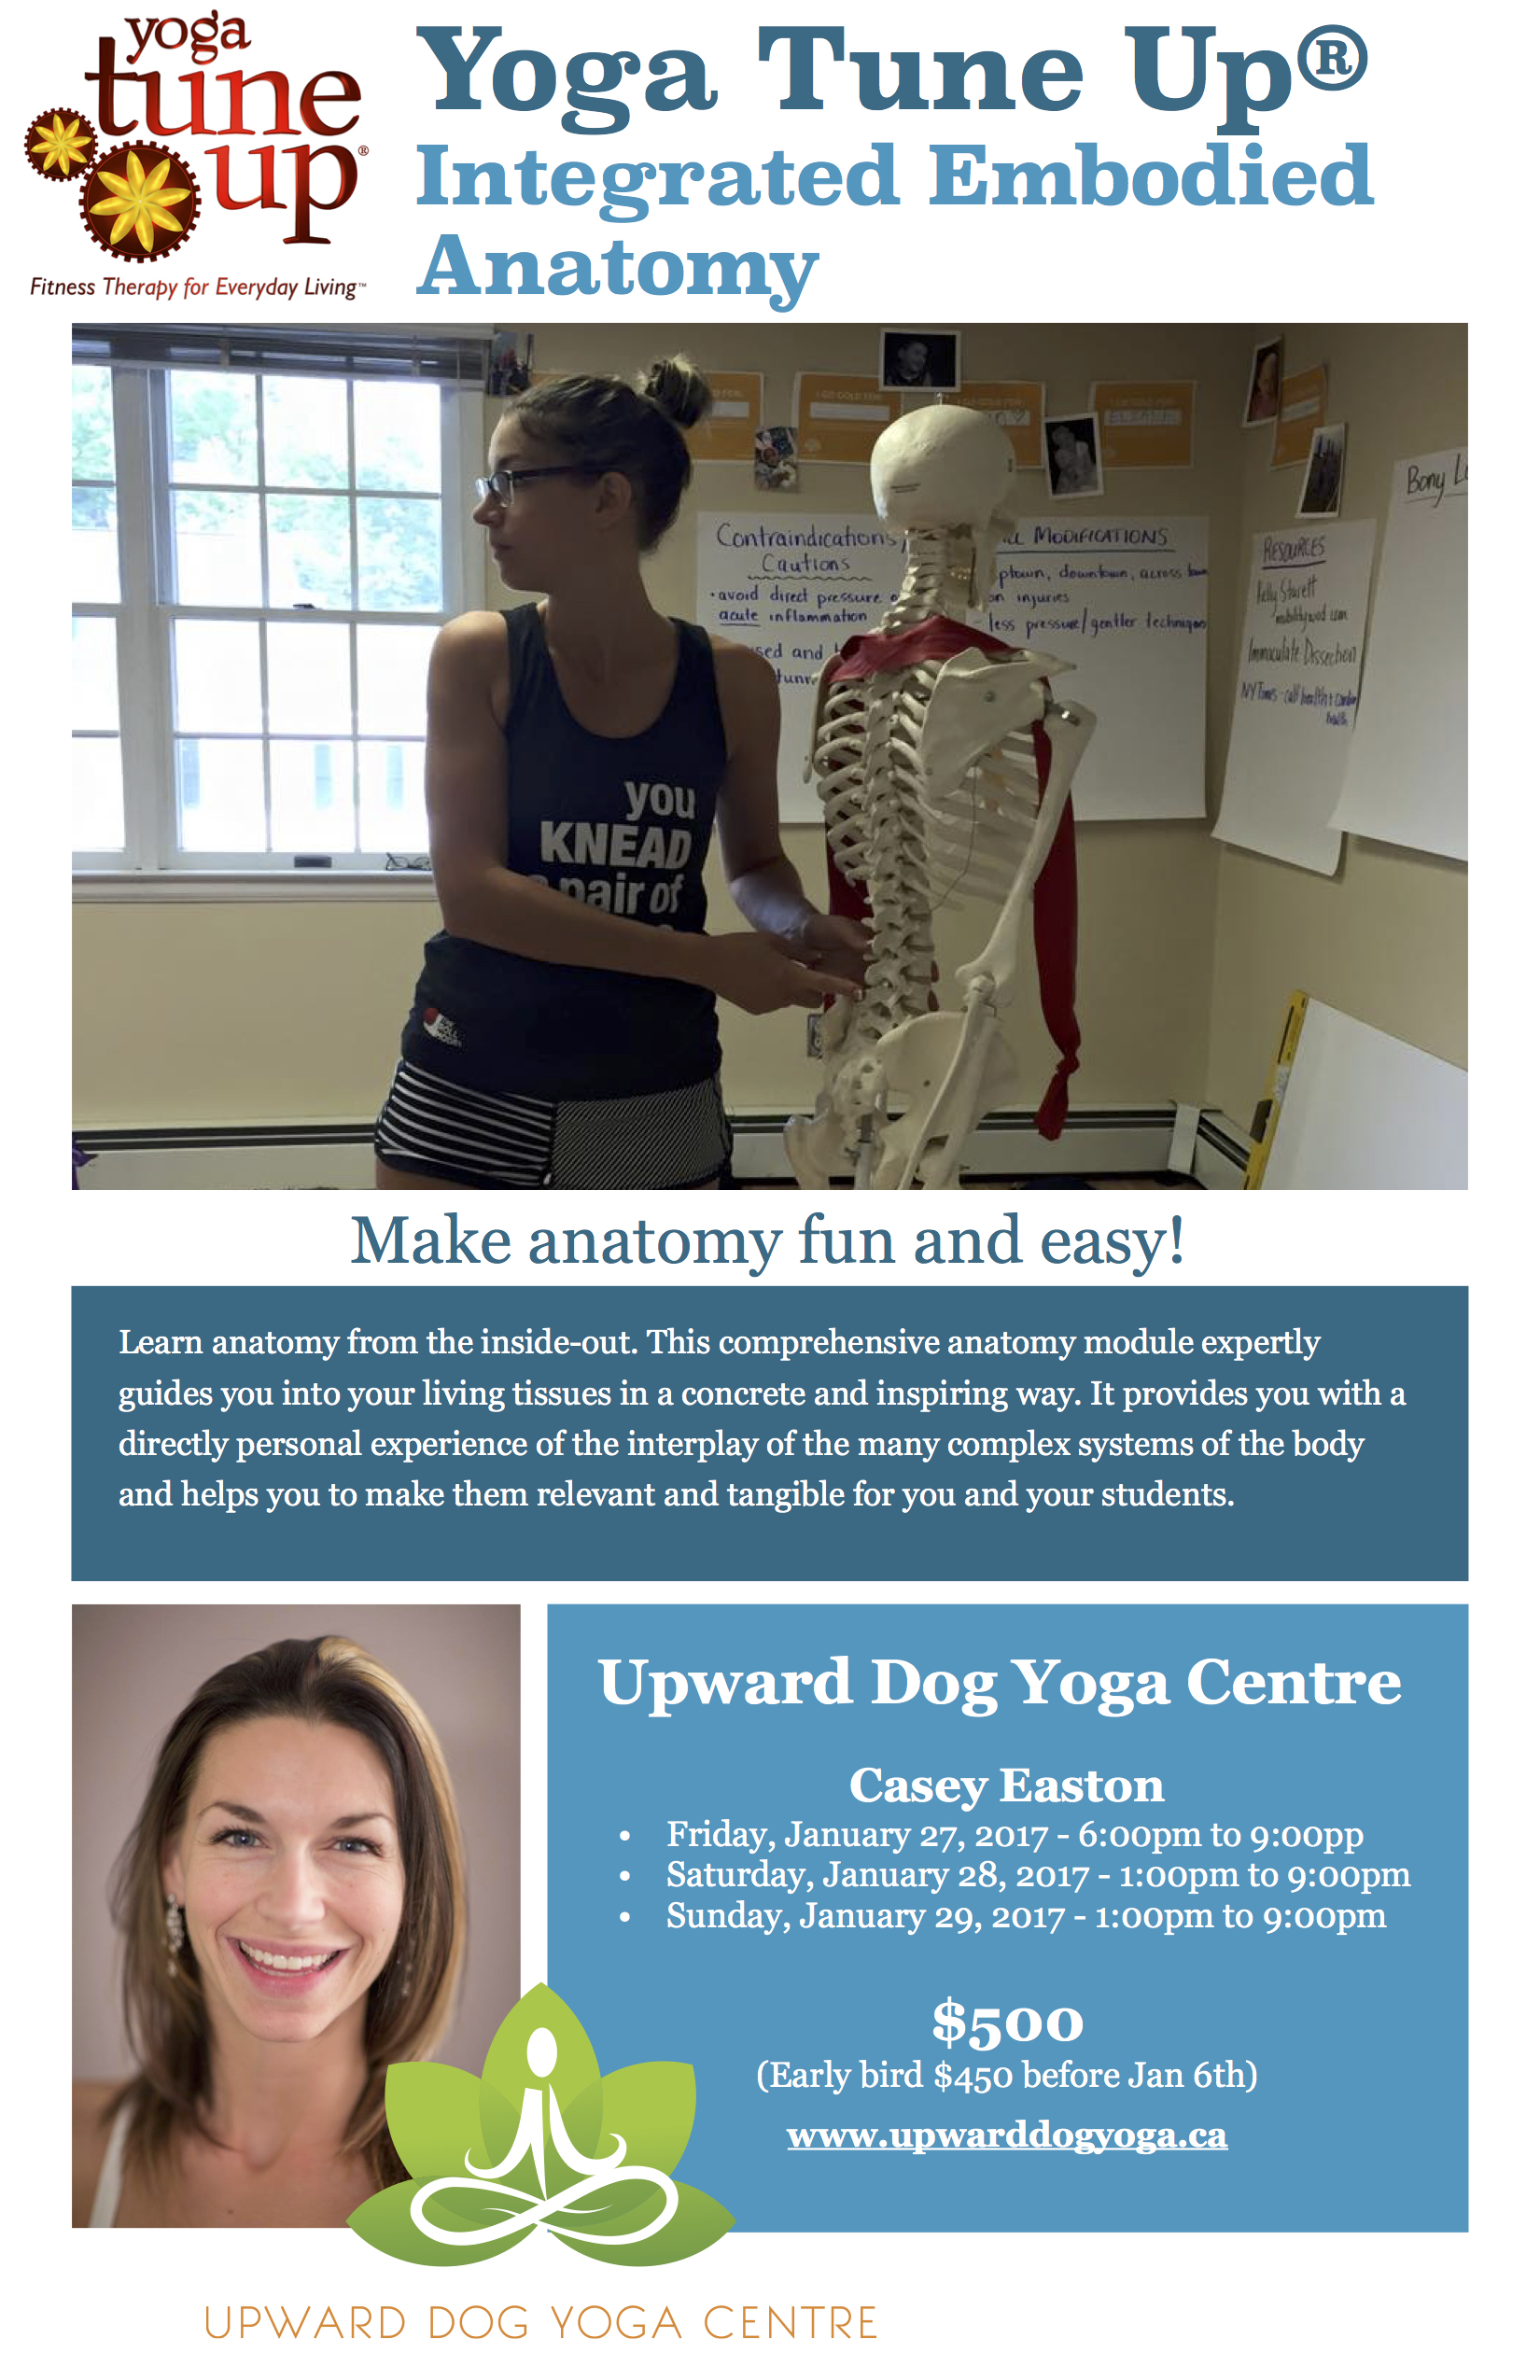 YTU Intergrated Embodied Anatomy.jpg